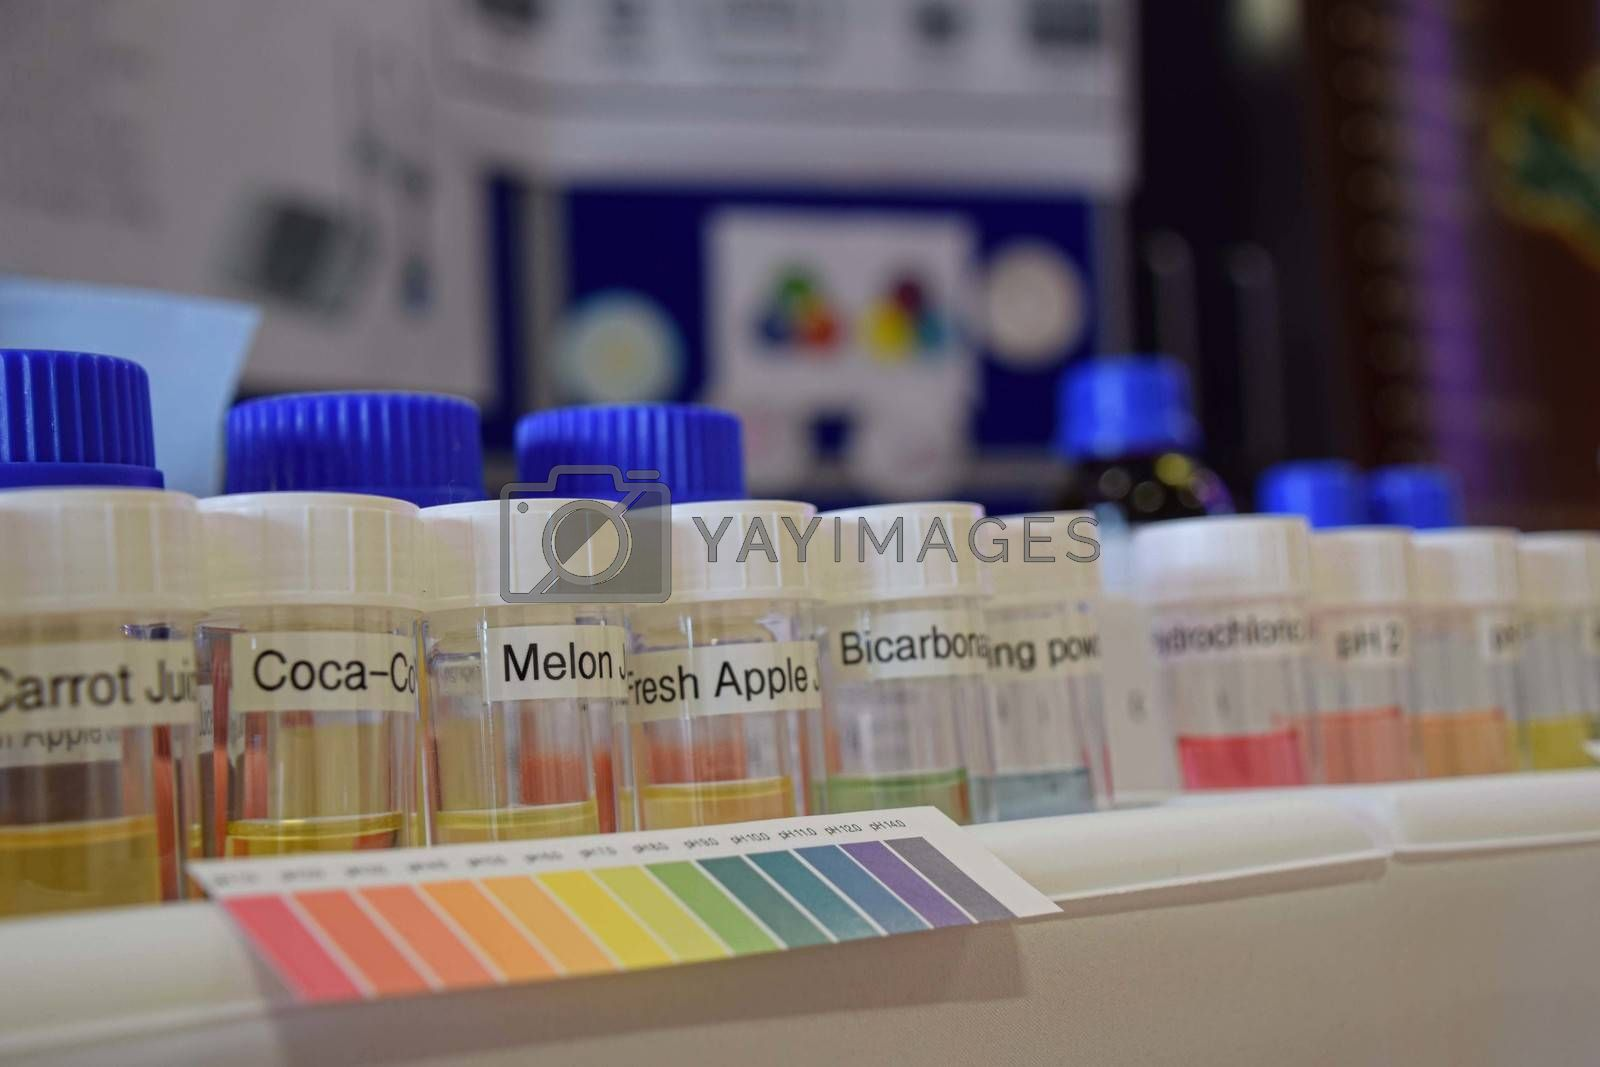 UK, Rothley - June 2015: School science day - chromatology